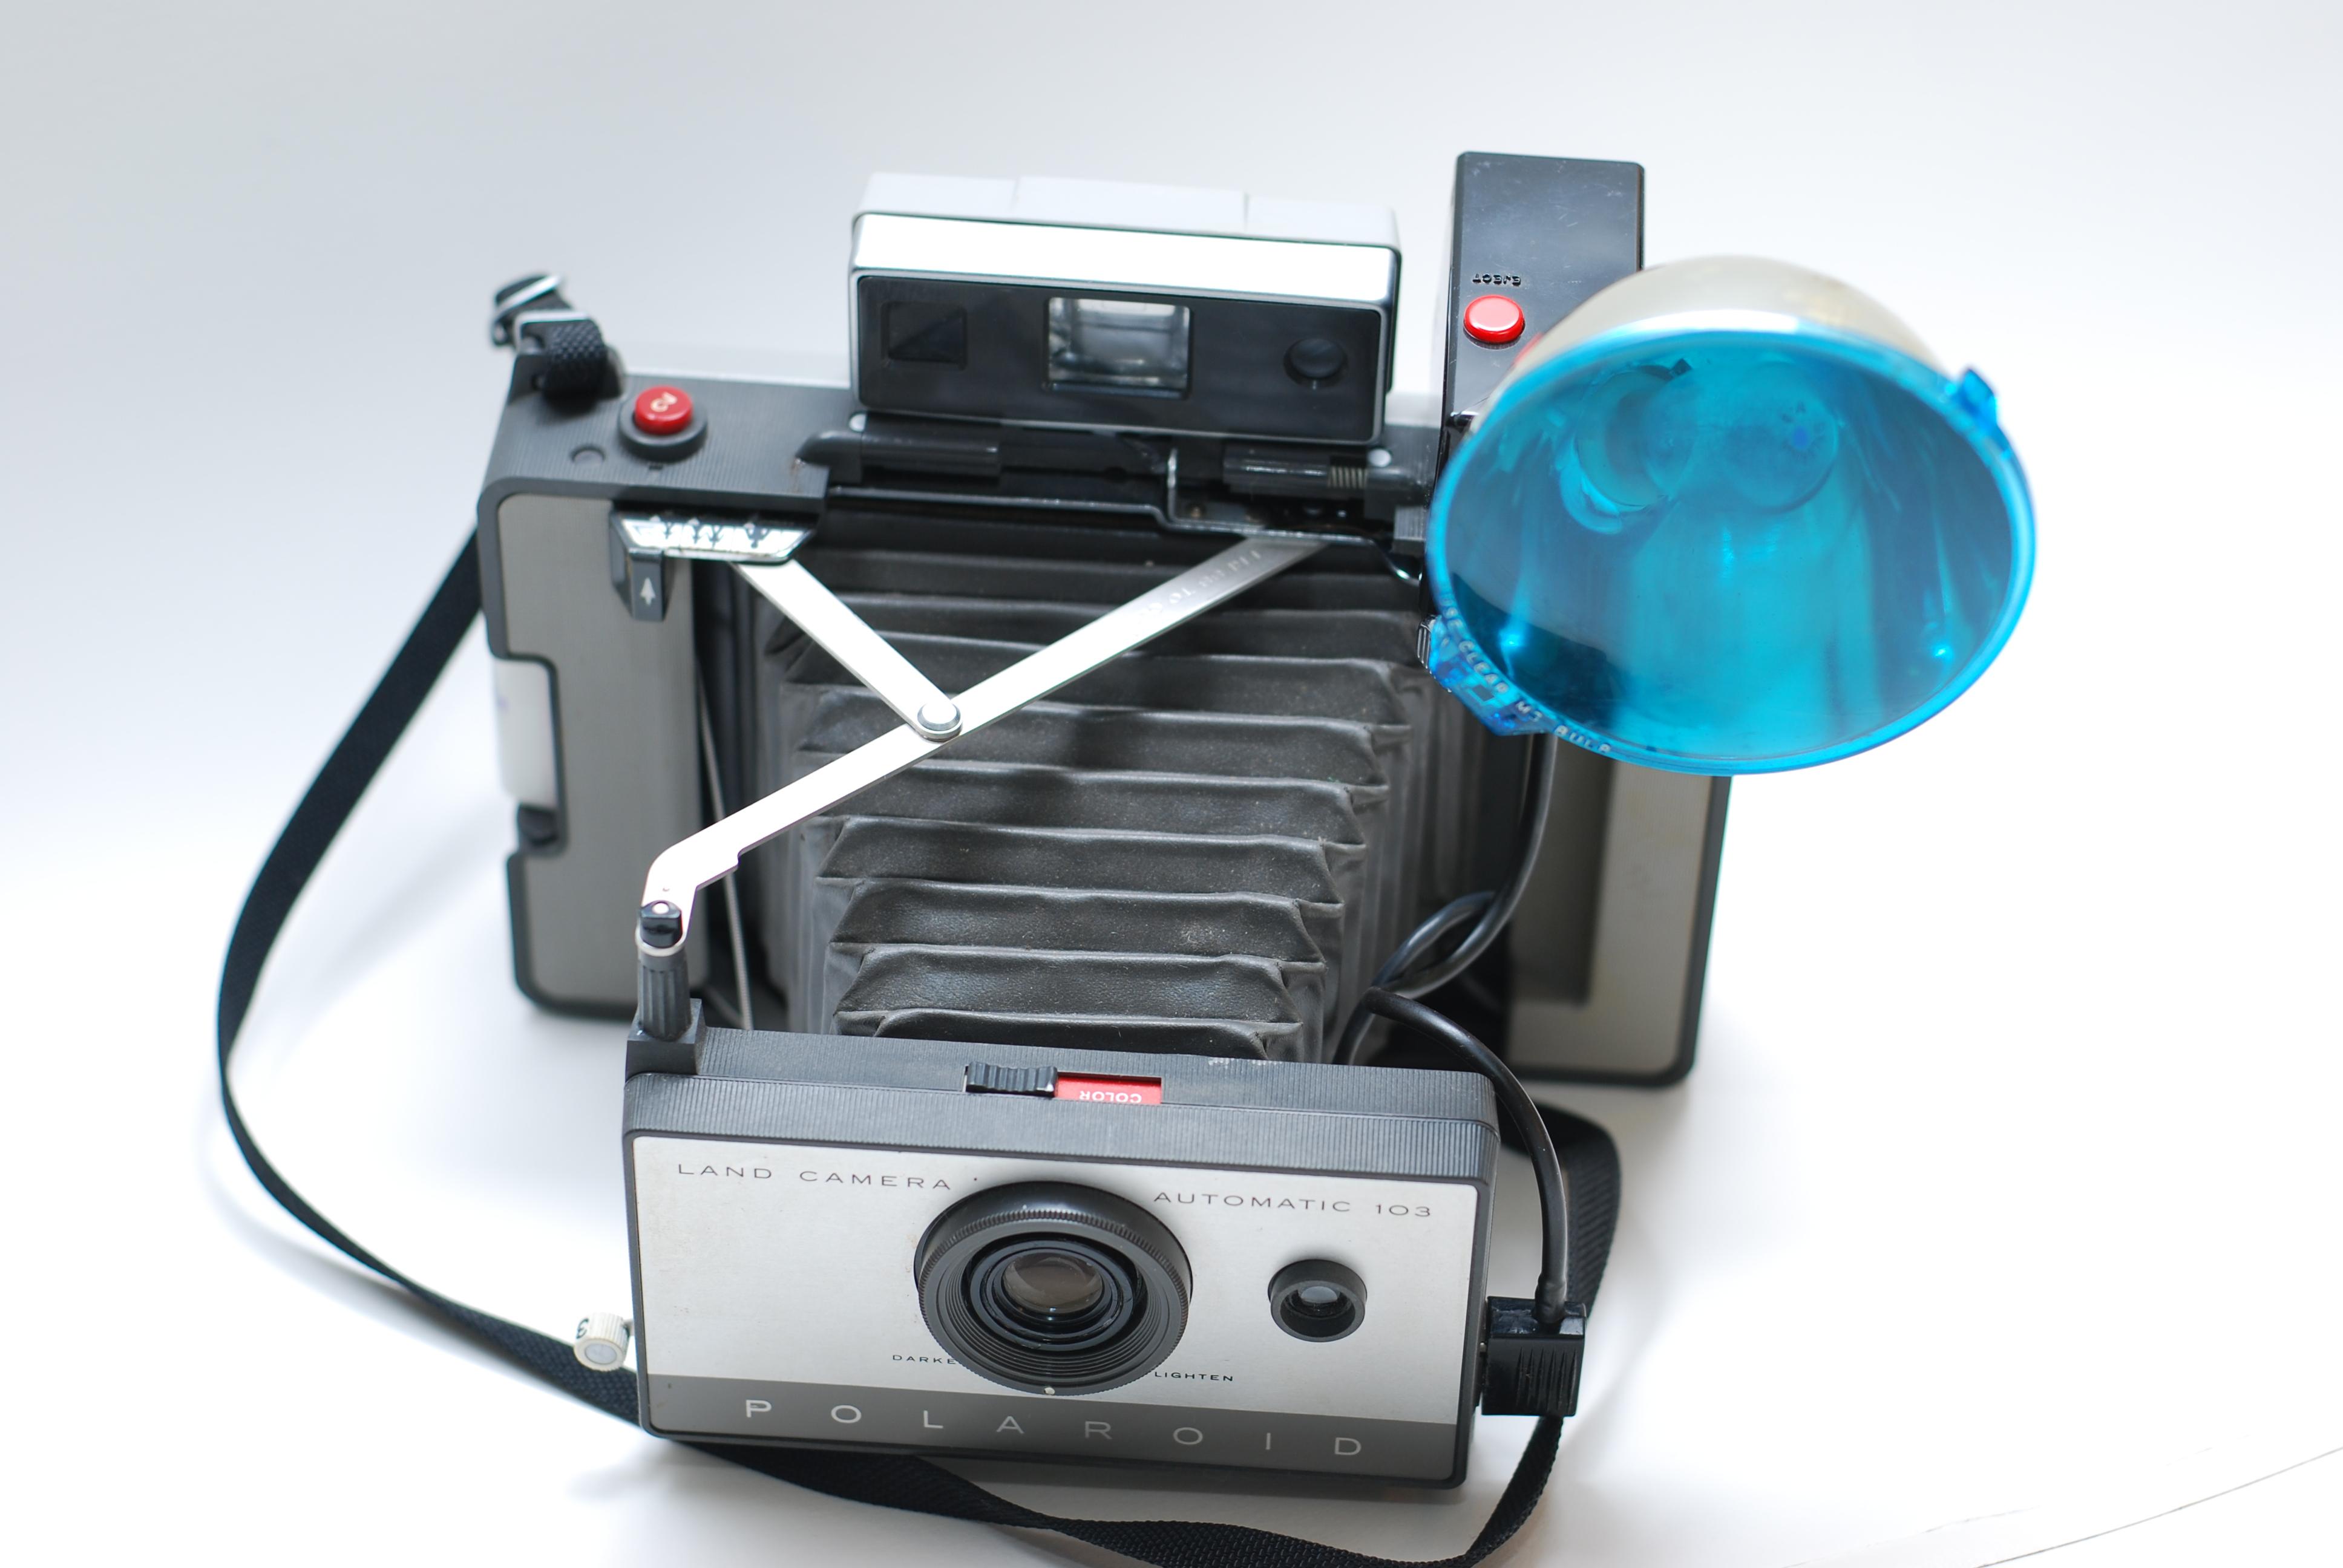 Best polaroid/instant camera long term?